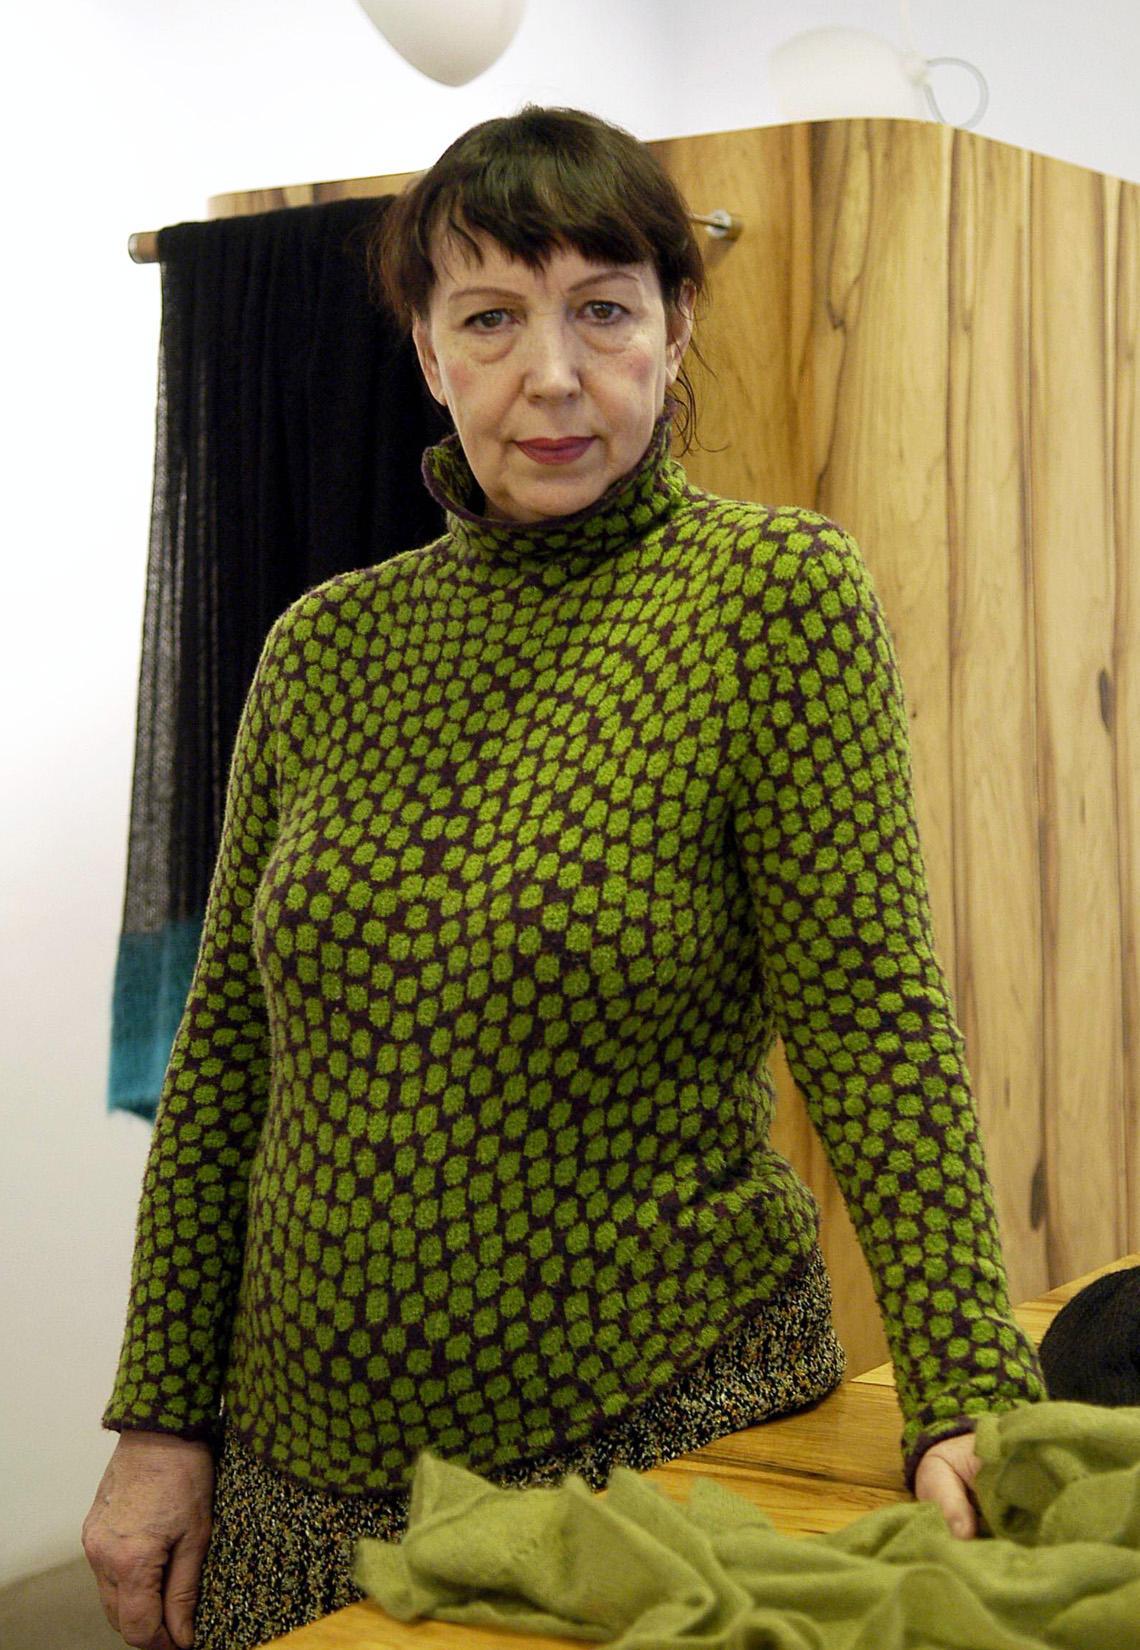 Freundin aus Berlin: Modedesignerin Claudia Skoda, 71